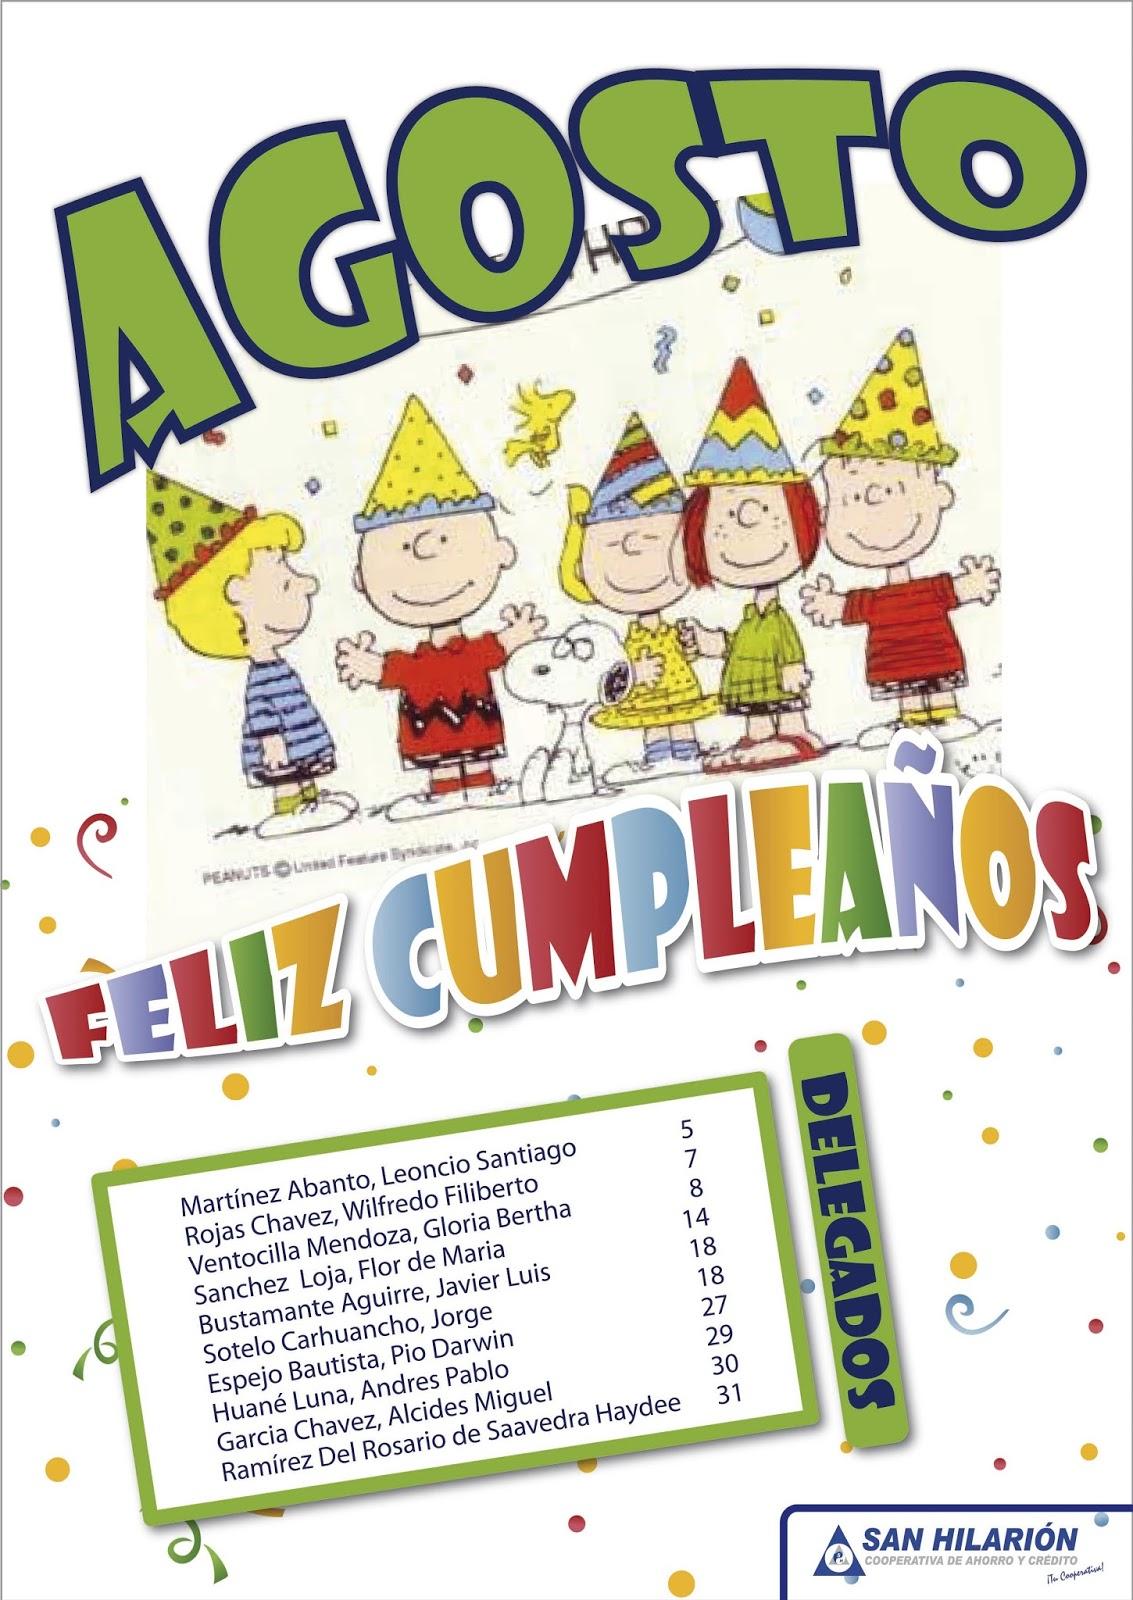 Cooperativa san hilari n agosto feliz cumplea os a for En agosto cumplo anos